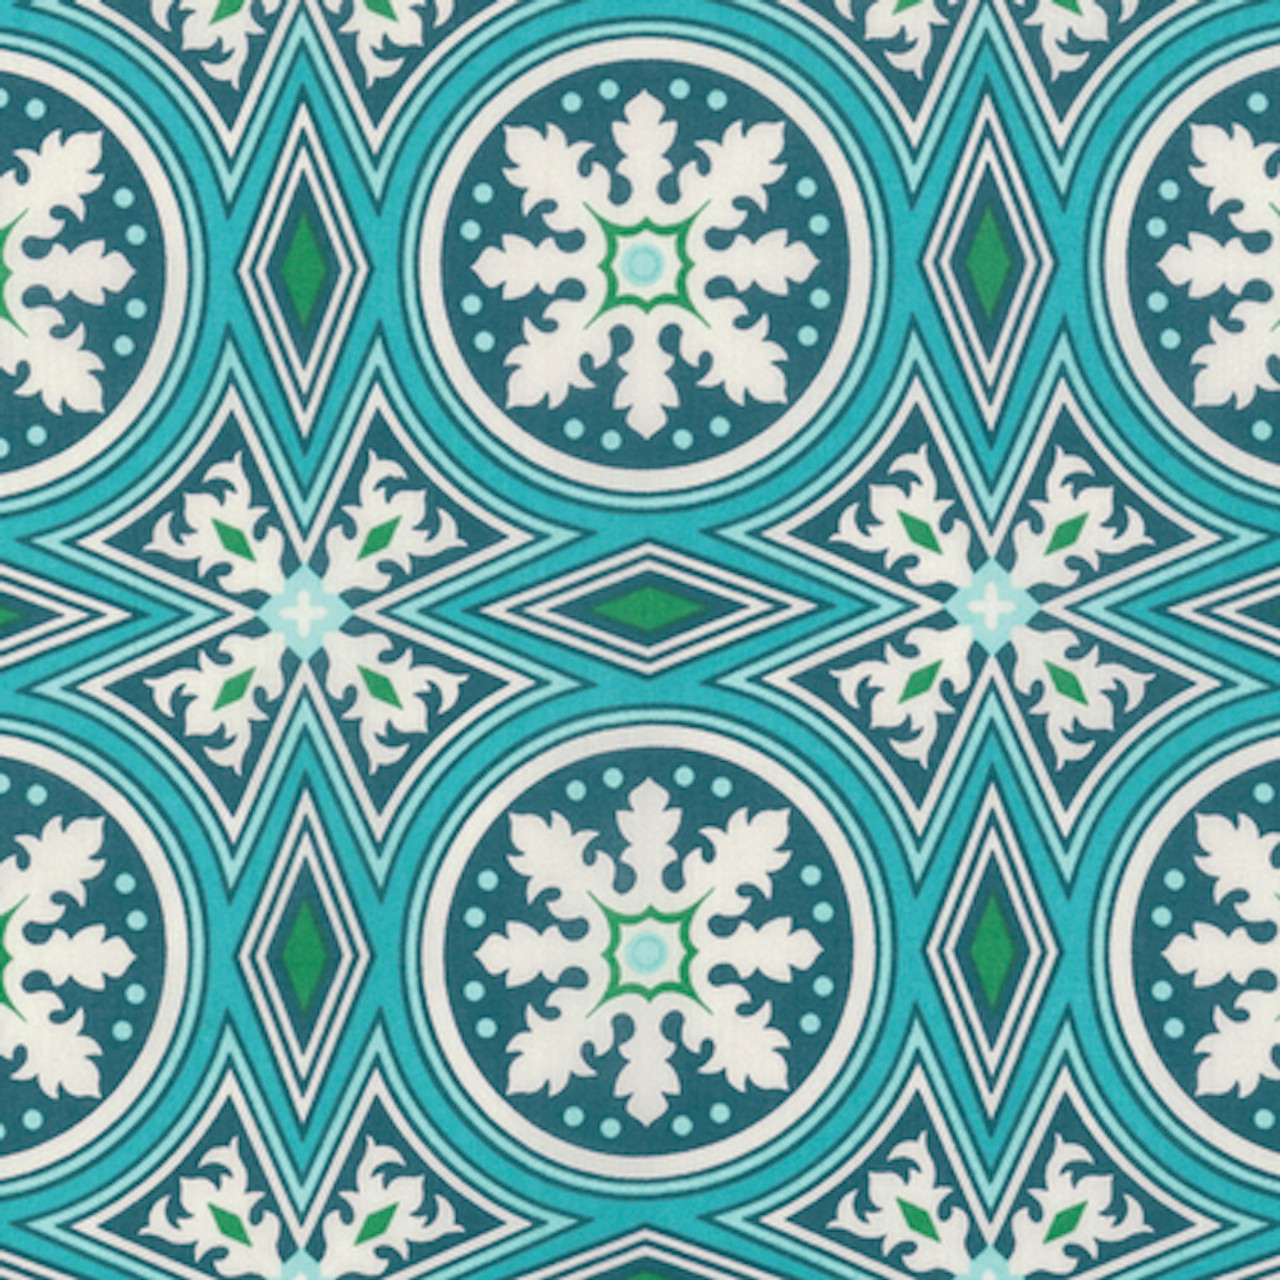 Joel Dewberry VOJD013 Modernist Tolson Peacock Cotton VOILE Fabric 8 Yard Bolt